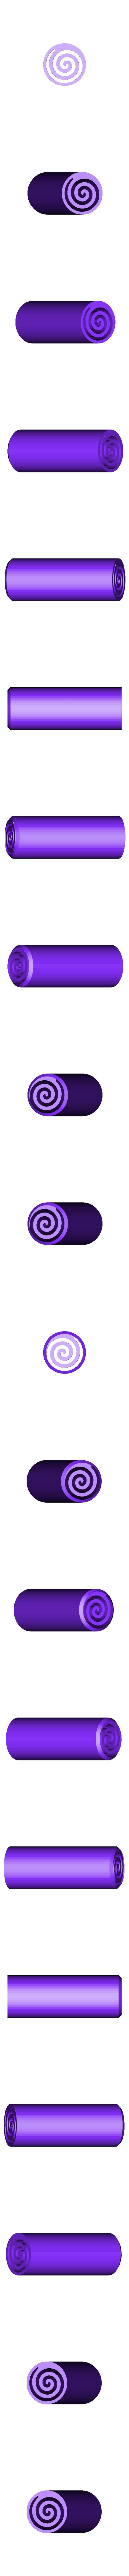 Filtro espiral.stl Download STL file FILTER TIPS - 89 FILTERS- ALL PACKS - WEED FILTER • 3D printer model, Weed420House